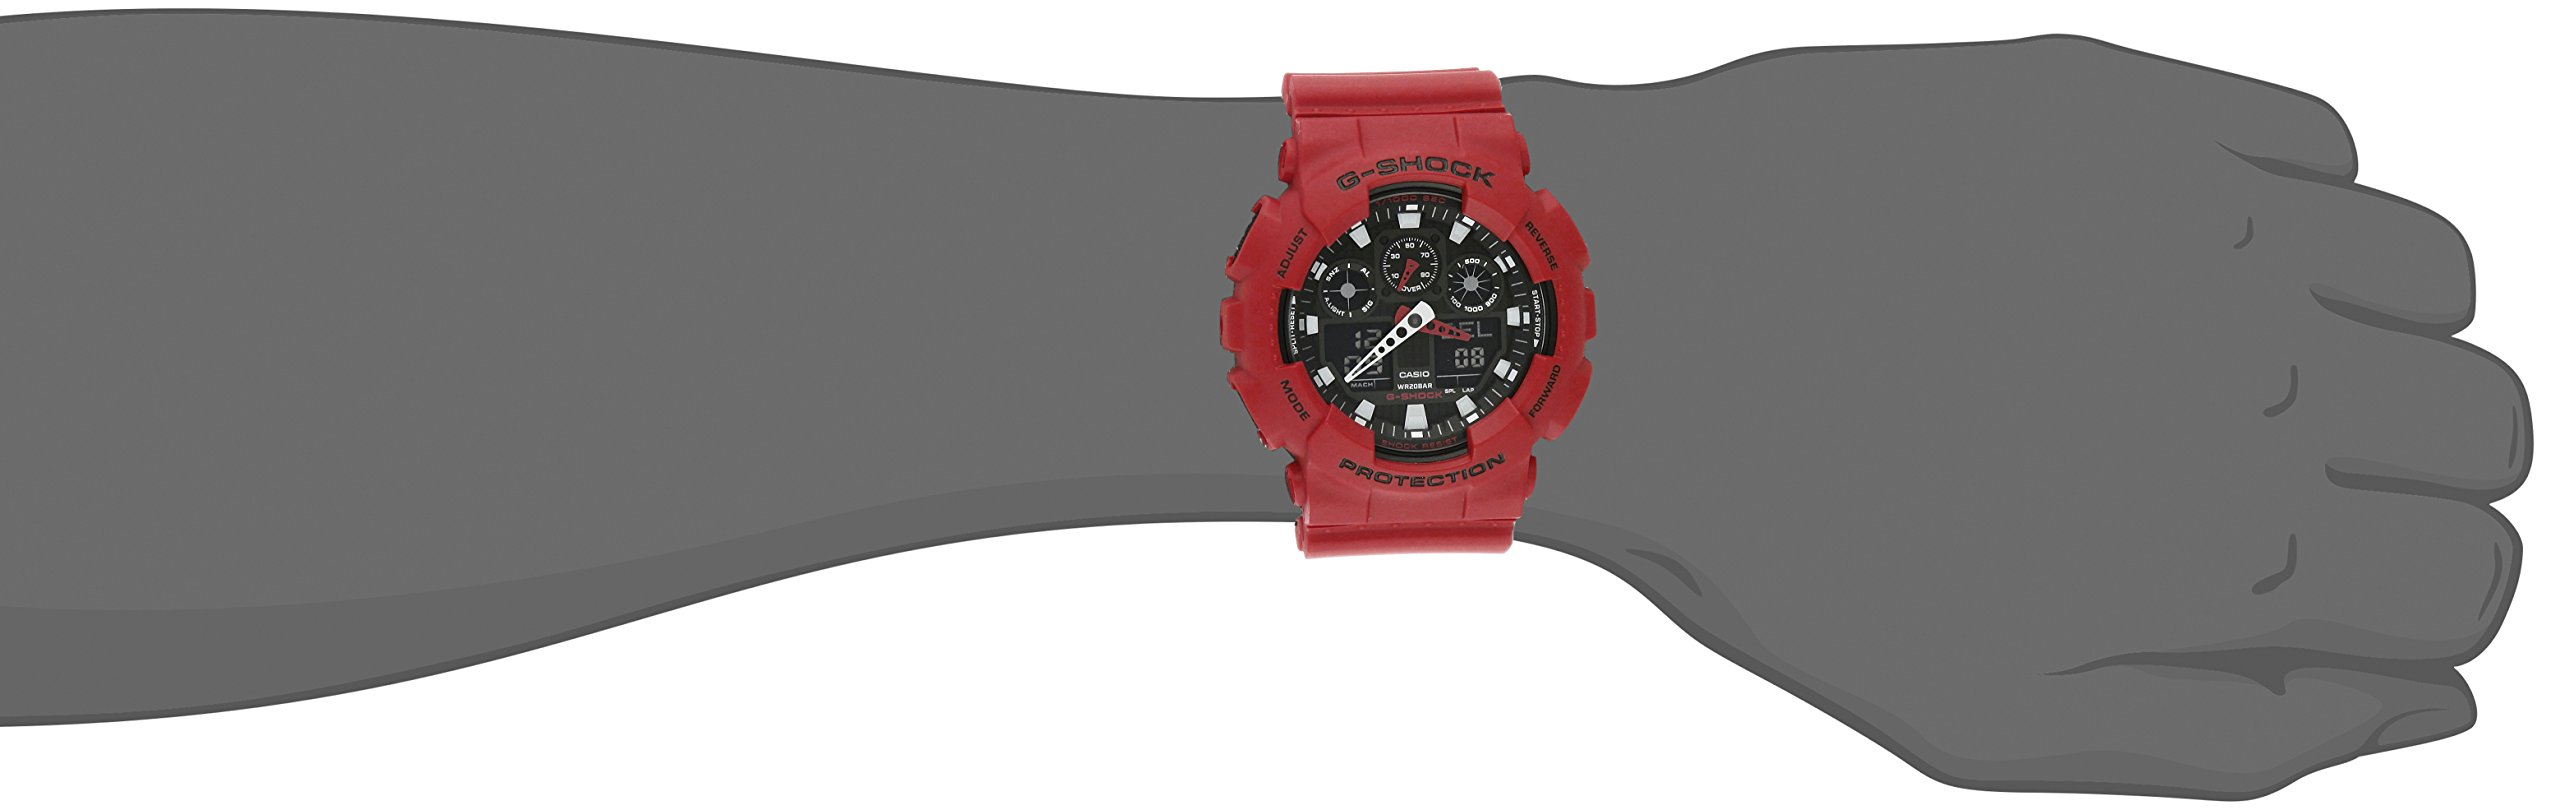 Casio Men's XL Series G-Shock Quartz 200M WR Shock Resistant Resin Color: Red (Model GA-100B-4ACR) by Casio (Image #2)